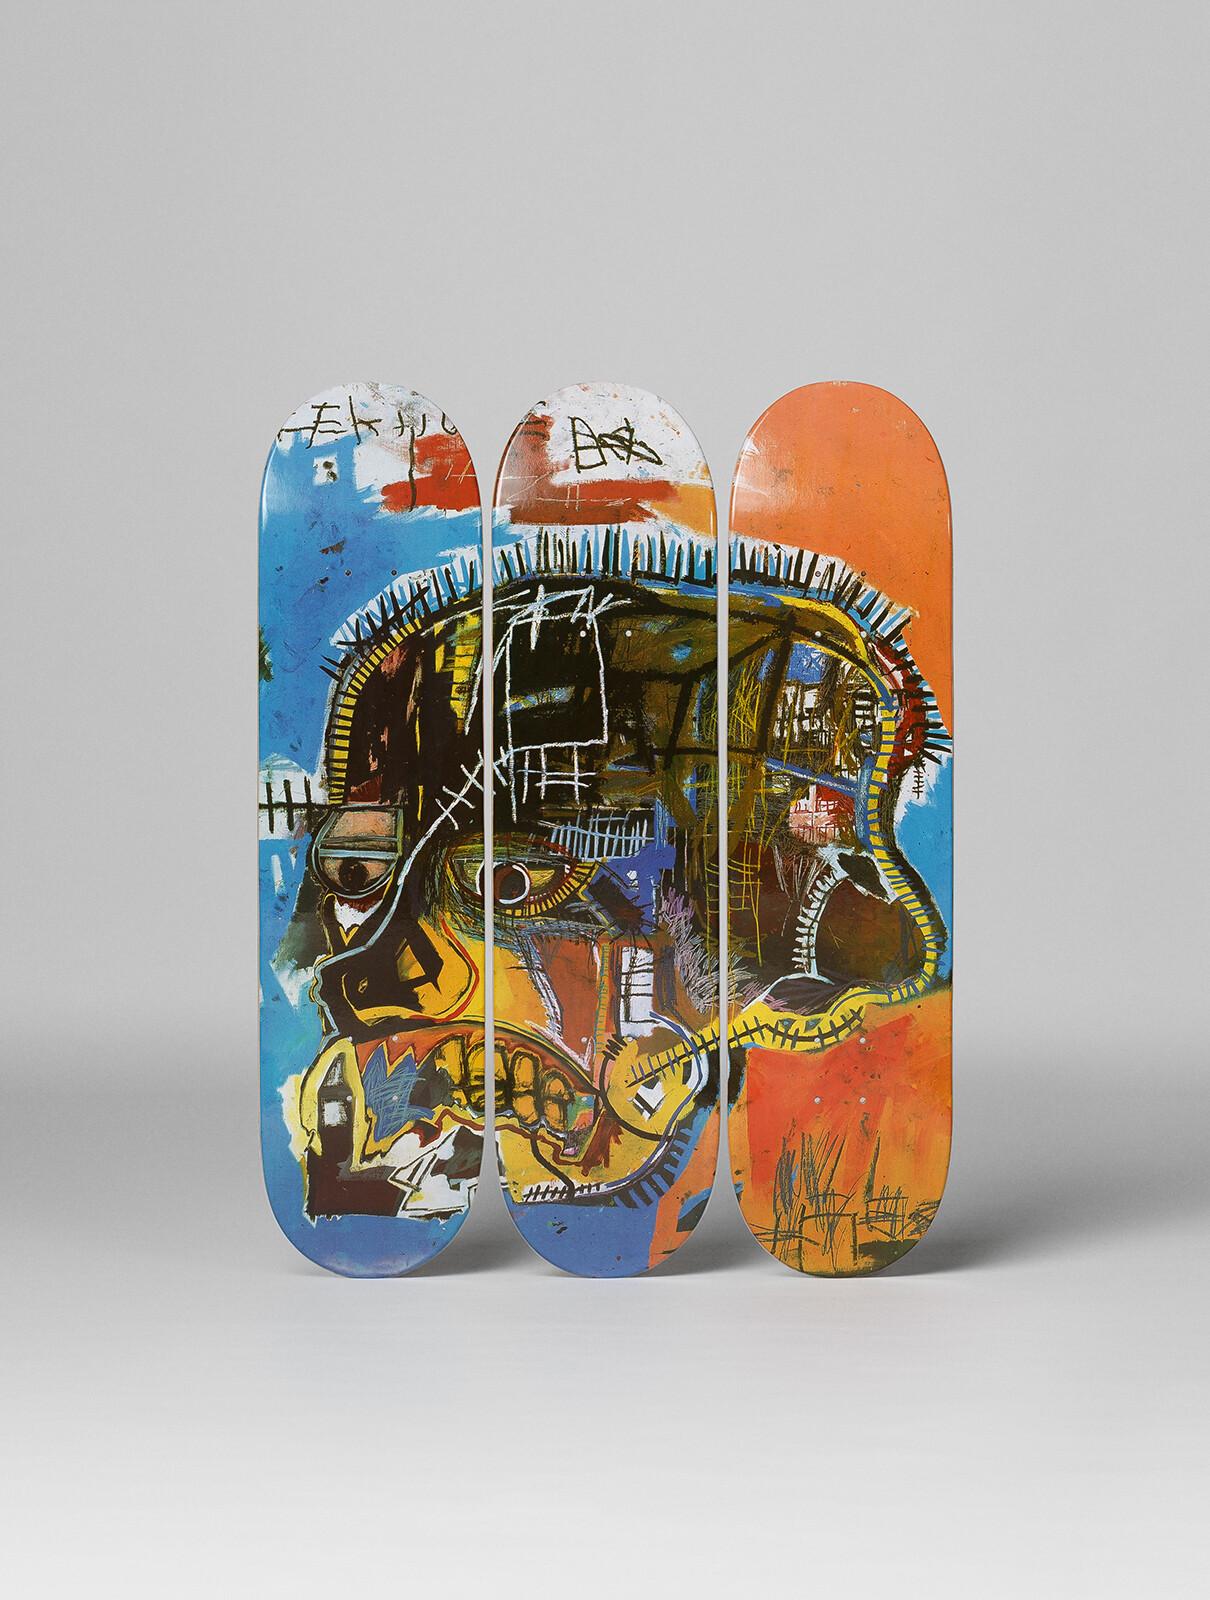 Skull - Jean - Michel Basquiat